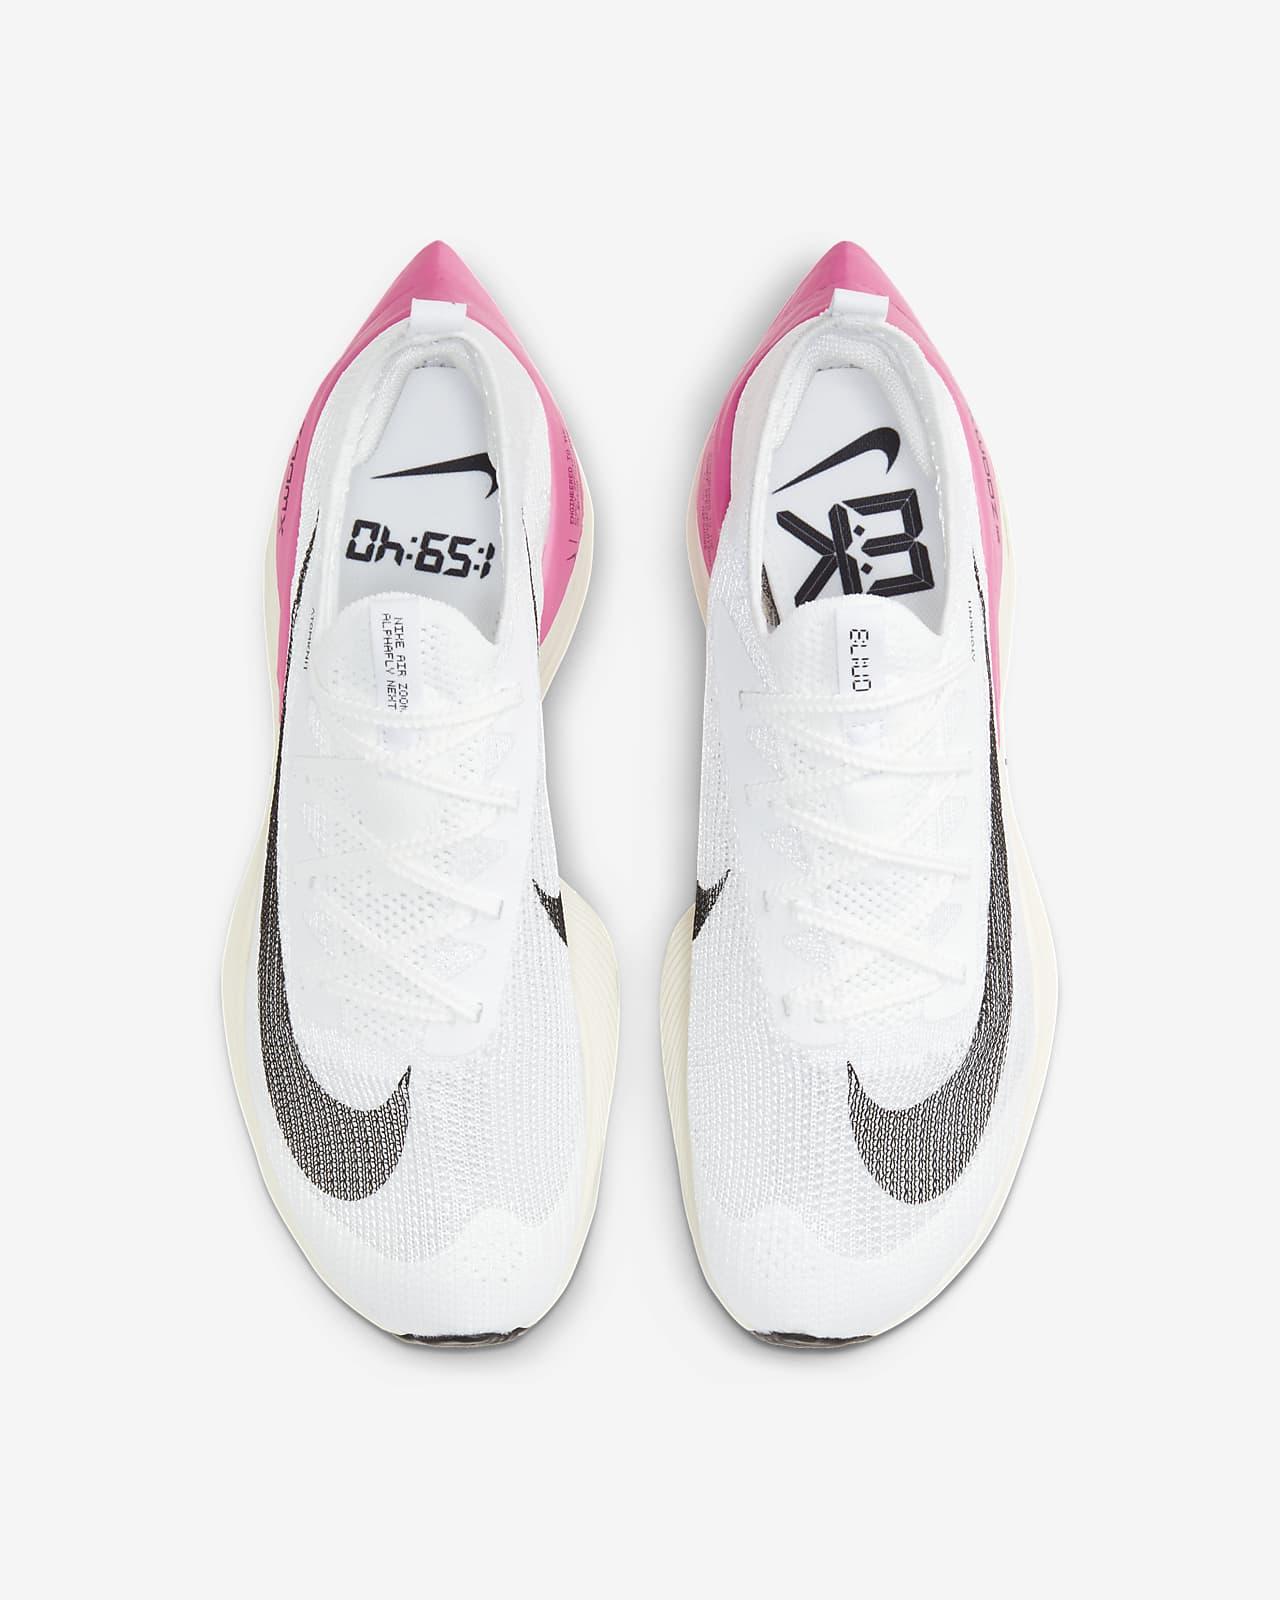 Eliud Kipchoge Men's Racing Shoe. Nike PH